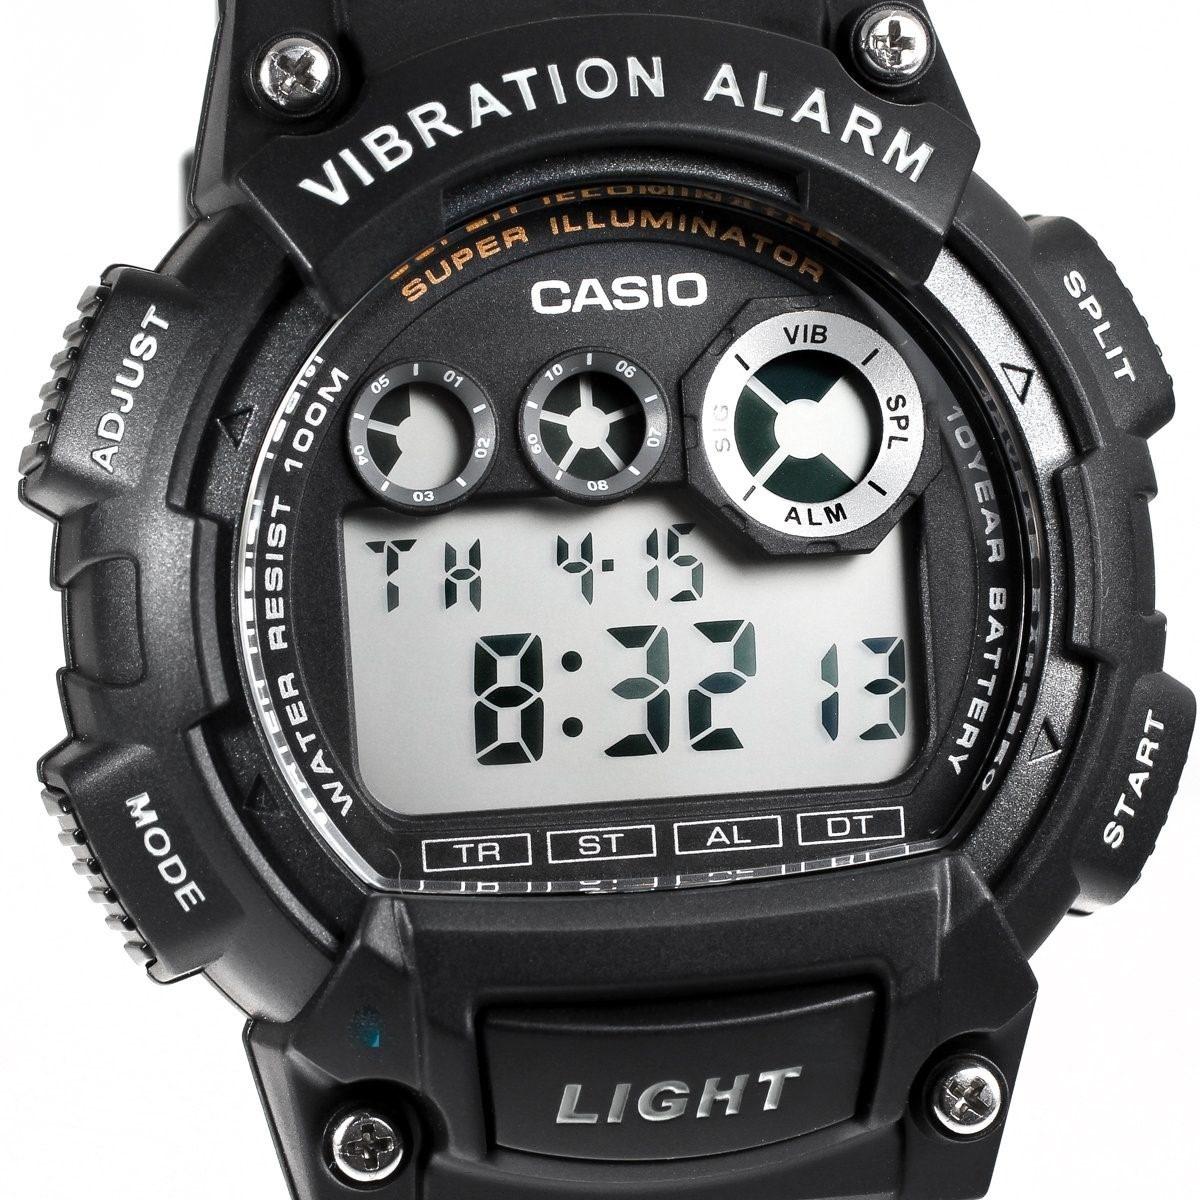 Alarm Casio Vibration Reloj Gratis W735h1avdf HombreEnvío CeBordx